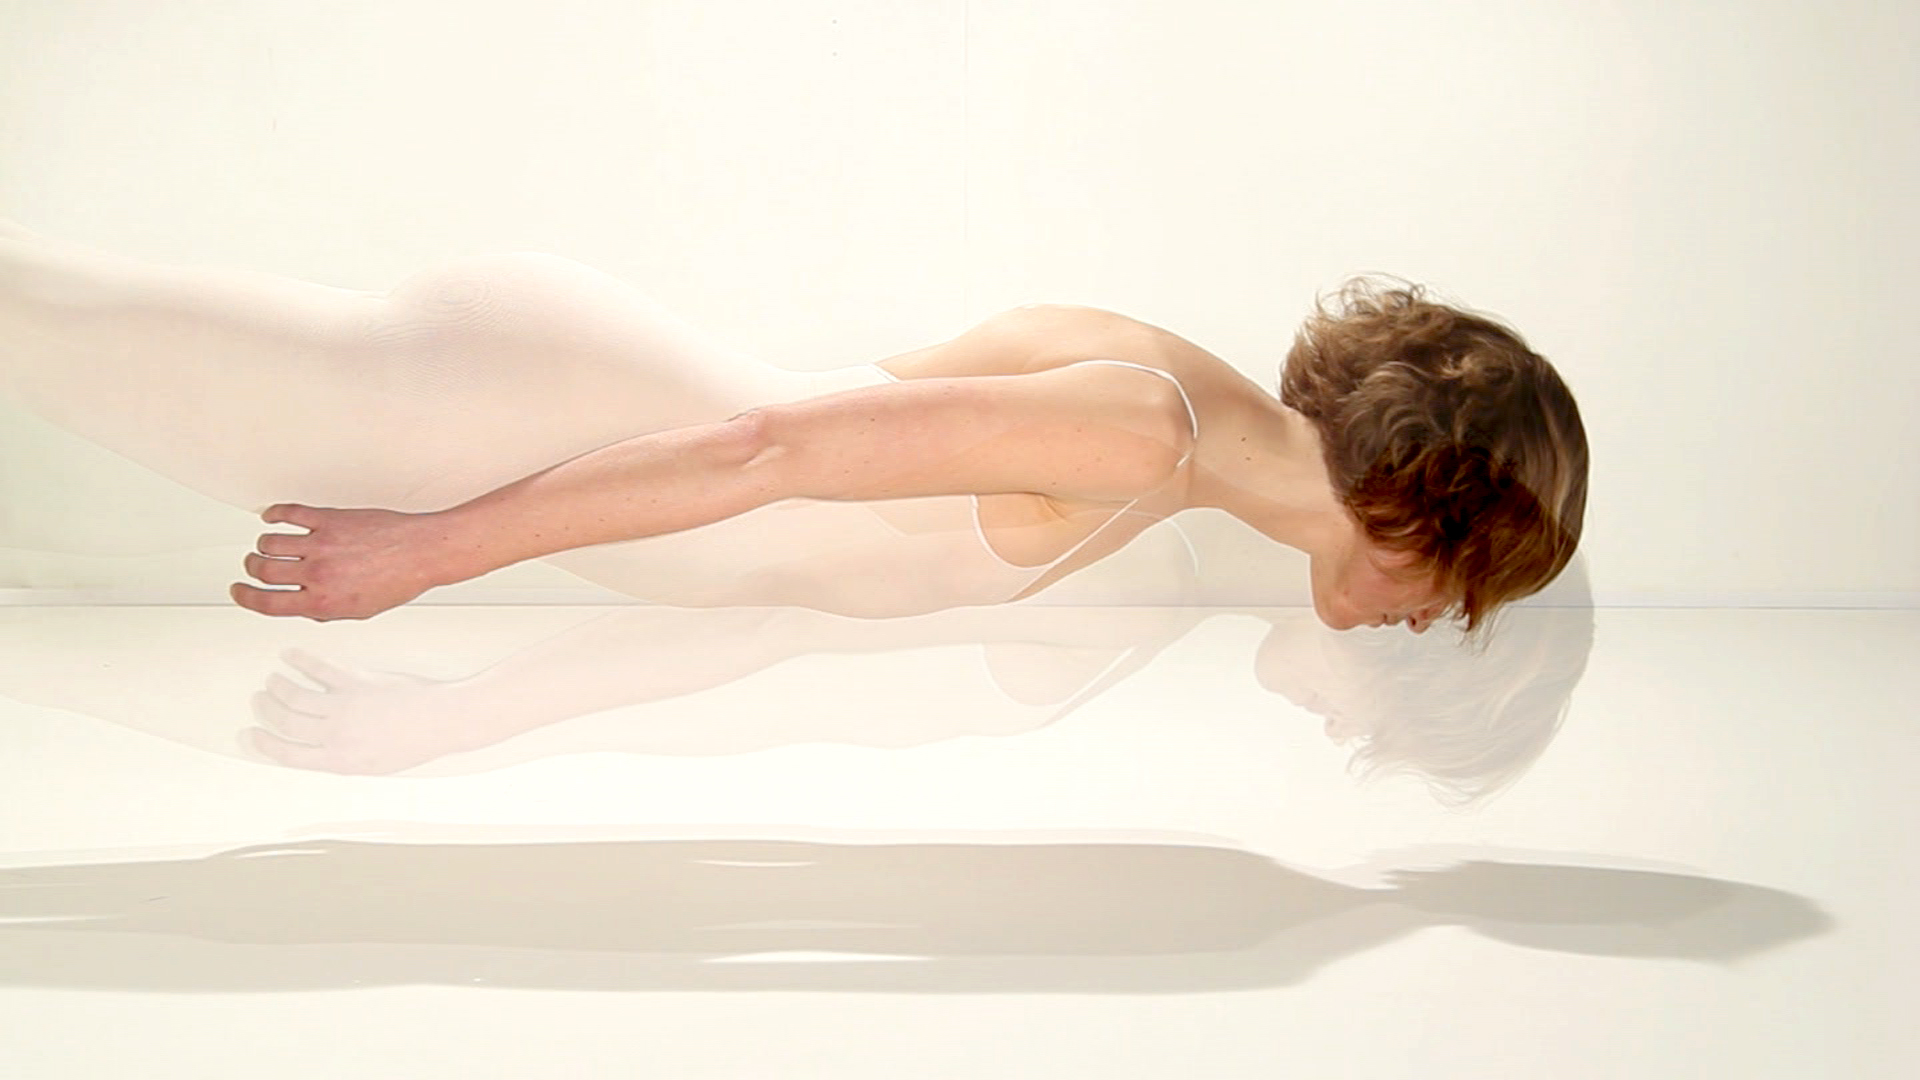 Anna Gilby, Breathing Space, 2009, digital video (still)